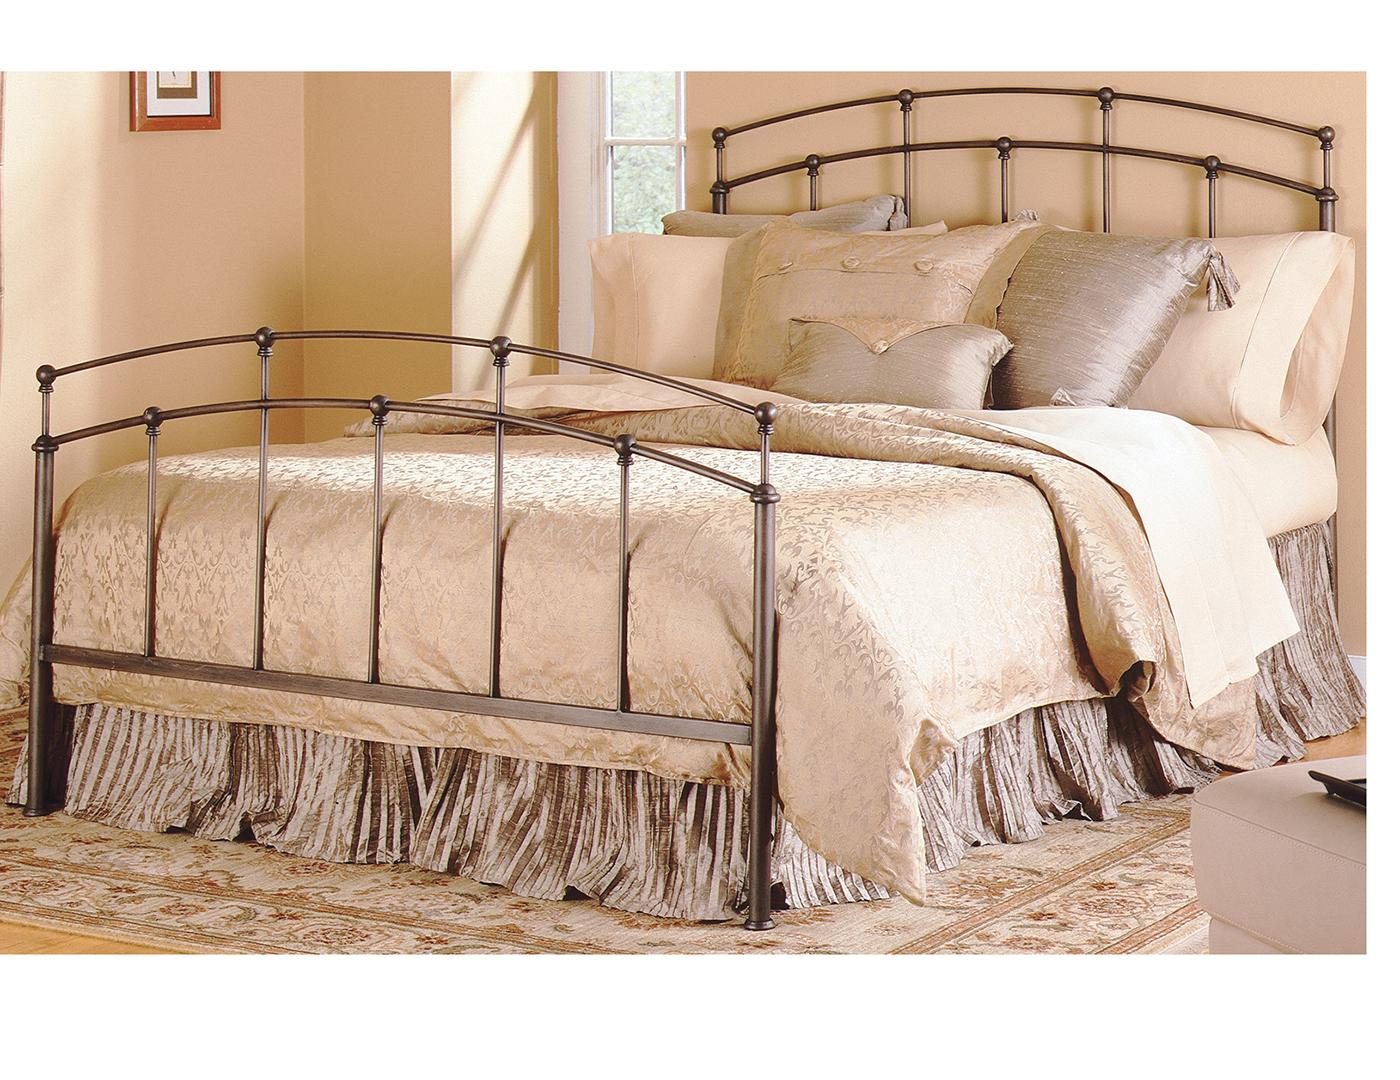 fenton king headboard and footboard steinhafels. Black Bedroom Furniture Sets. Home Design Ideas